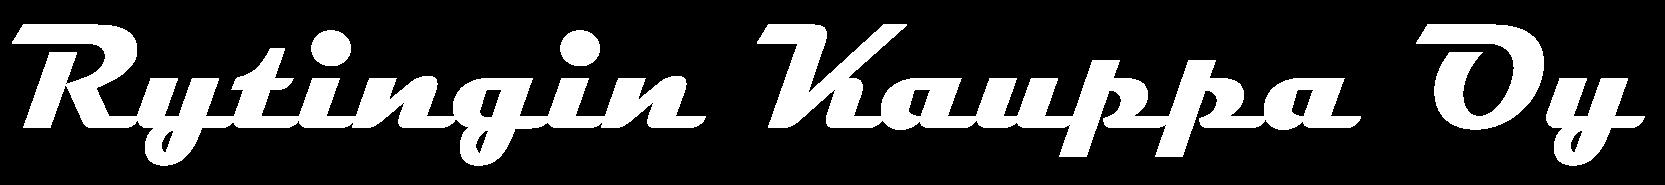 https://rytinginkauppa.fi/wp-content/uploads/2020/12/cropped-Rytingin-Kauppa-logo.png